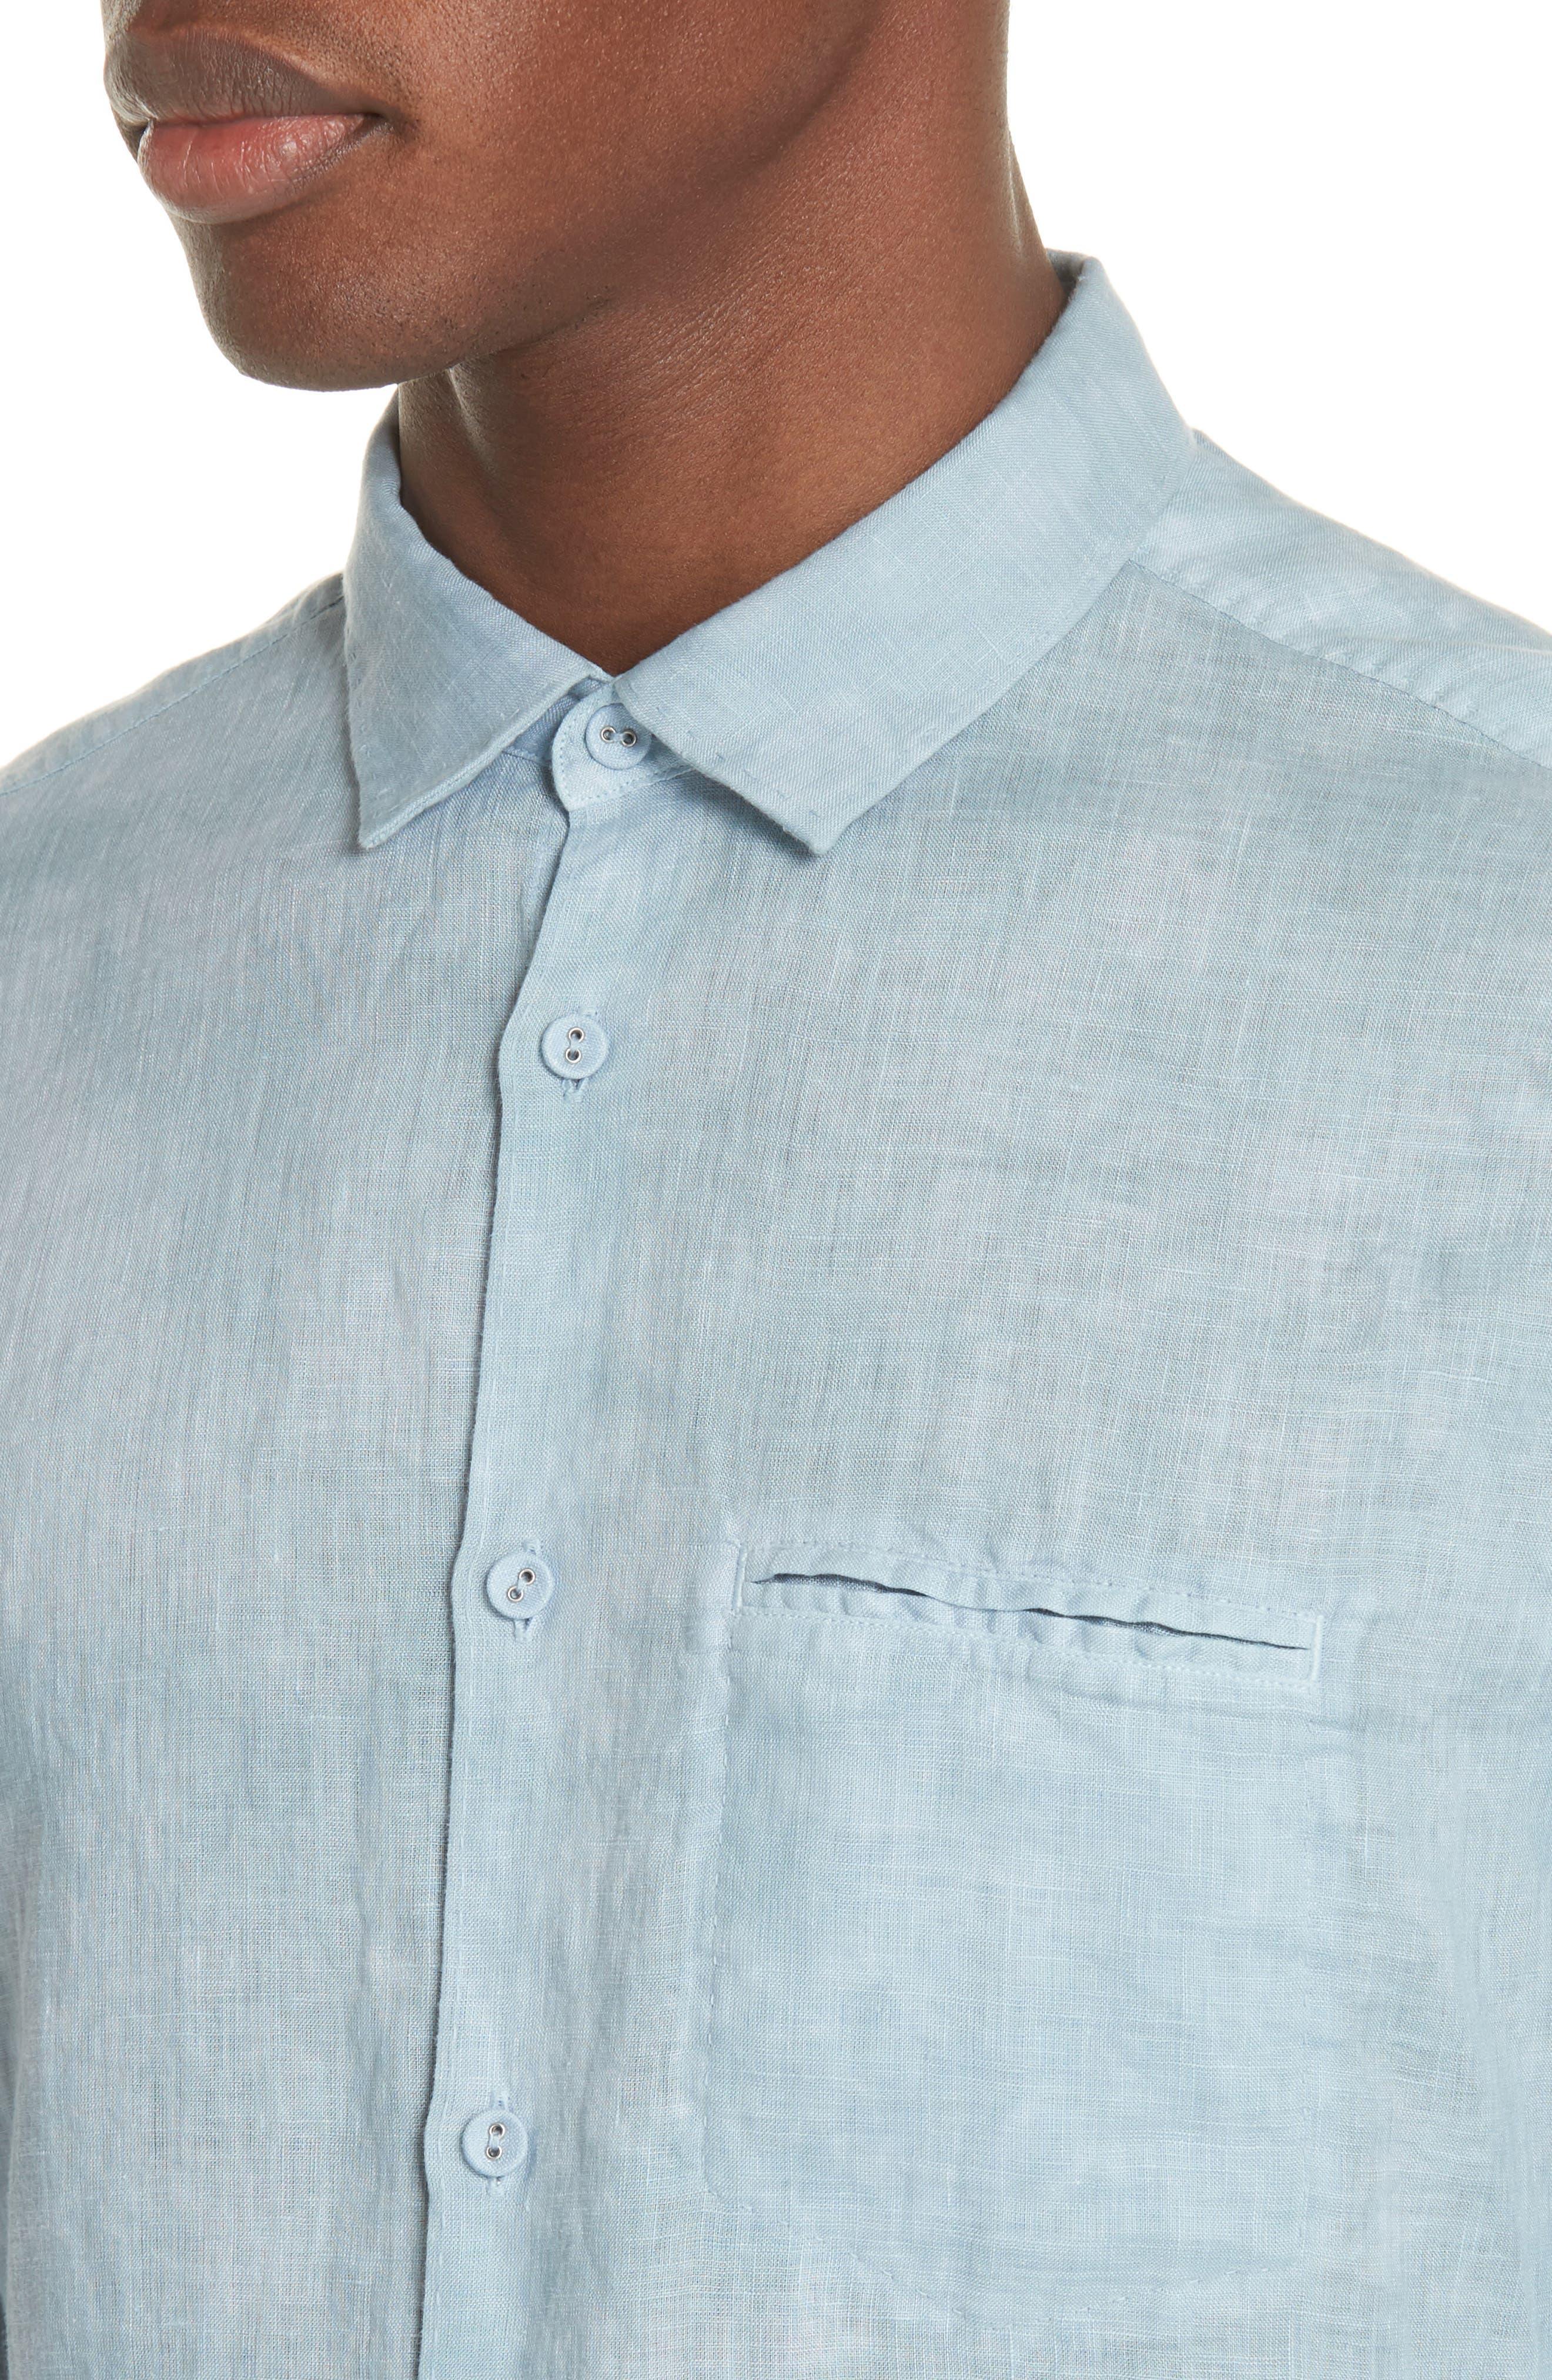 Linen Sport Shirt,                             Alternate thumbnail 4, color,                             SKY BLUE